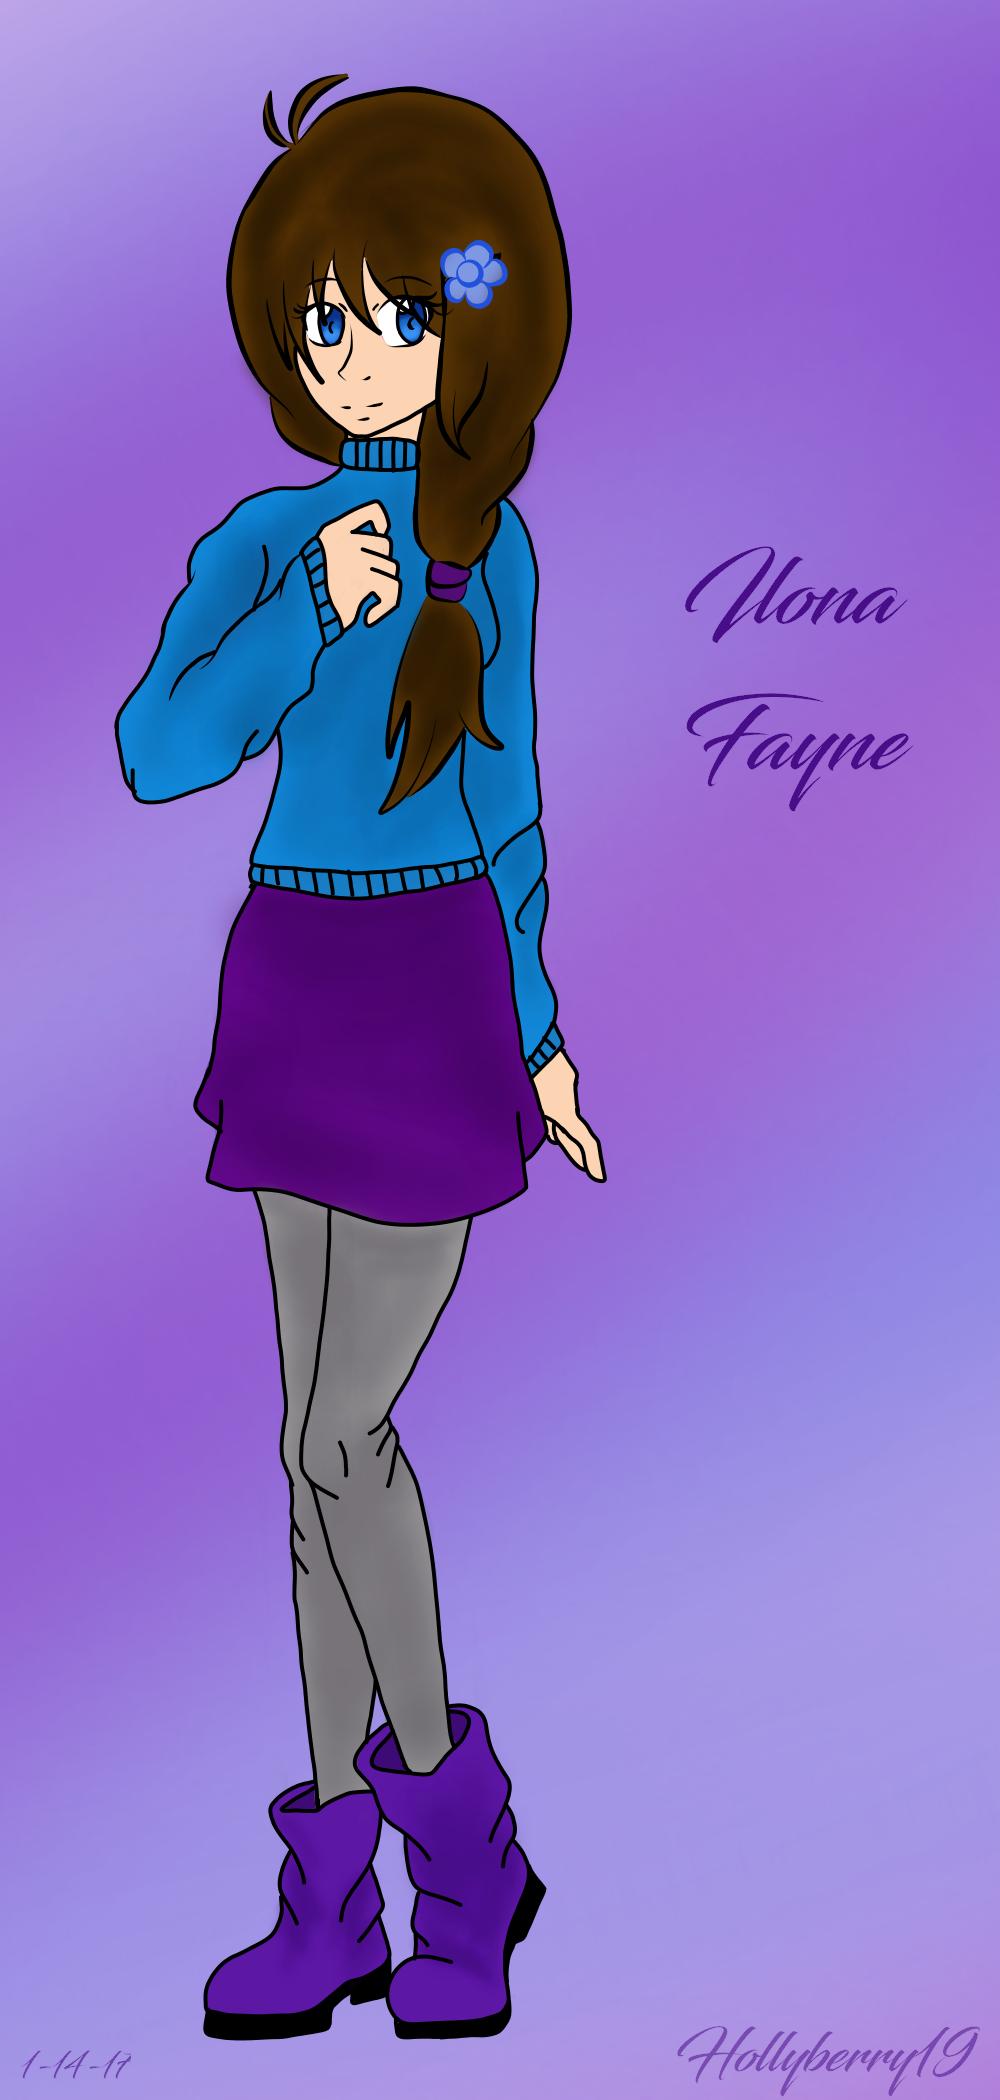 Modern day Ilona by EmpatheticMortalAnge